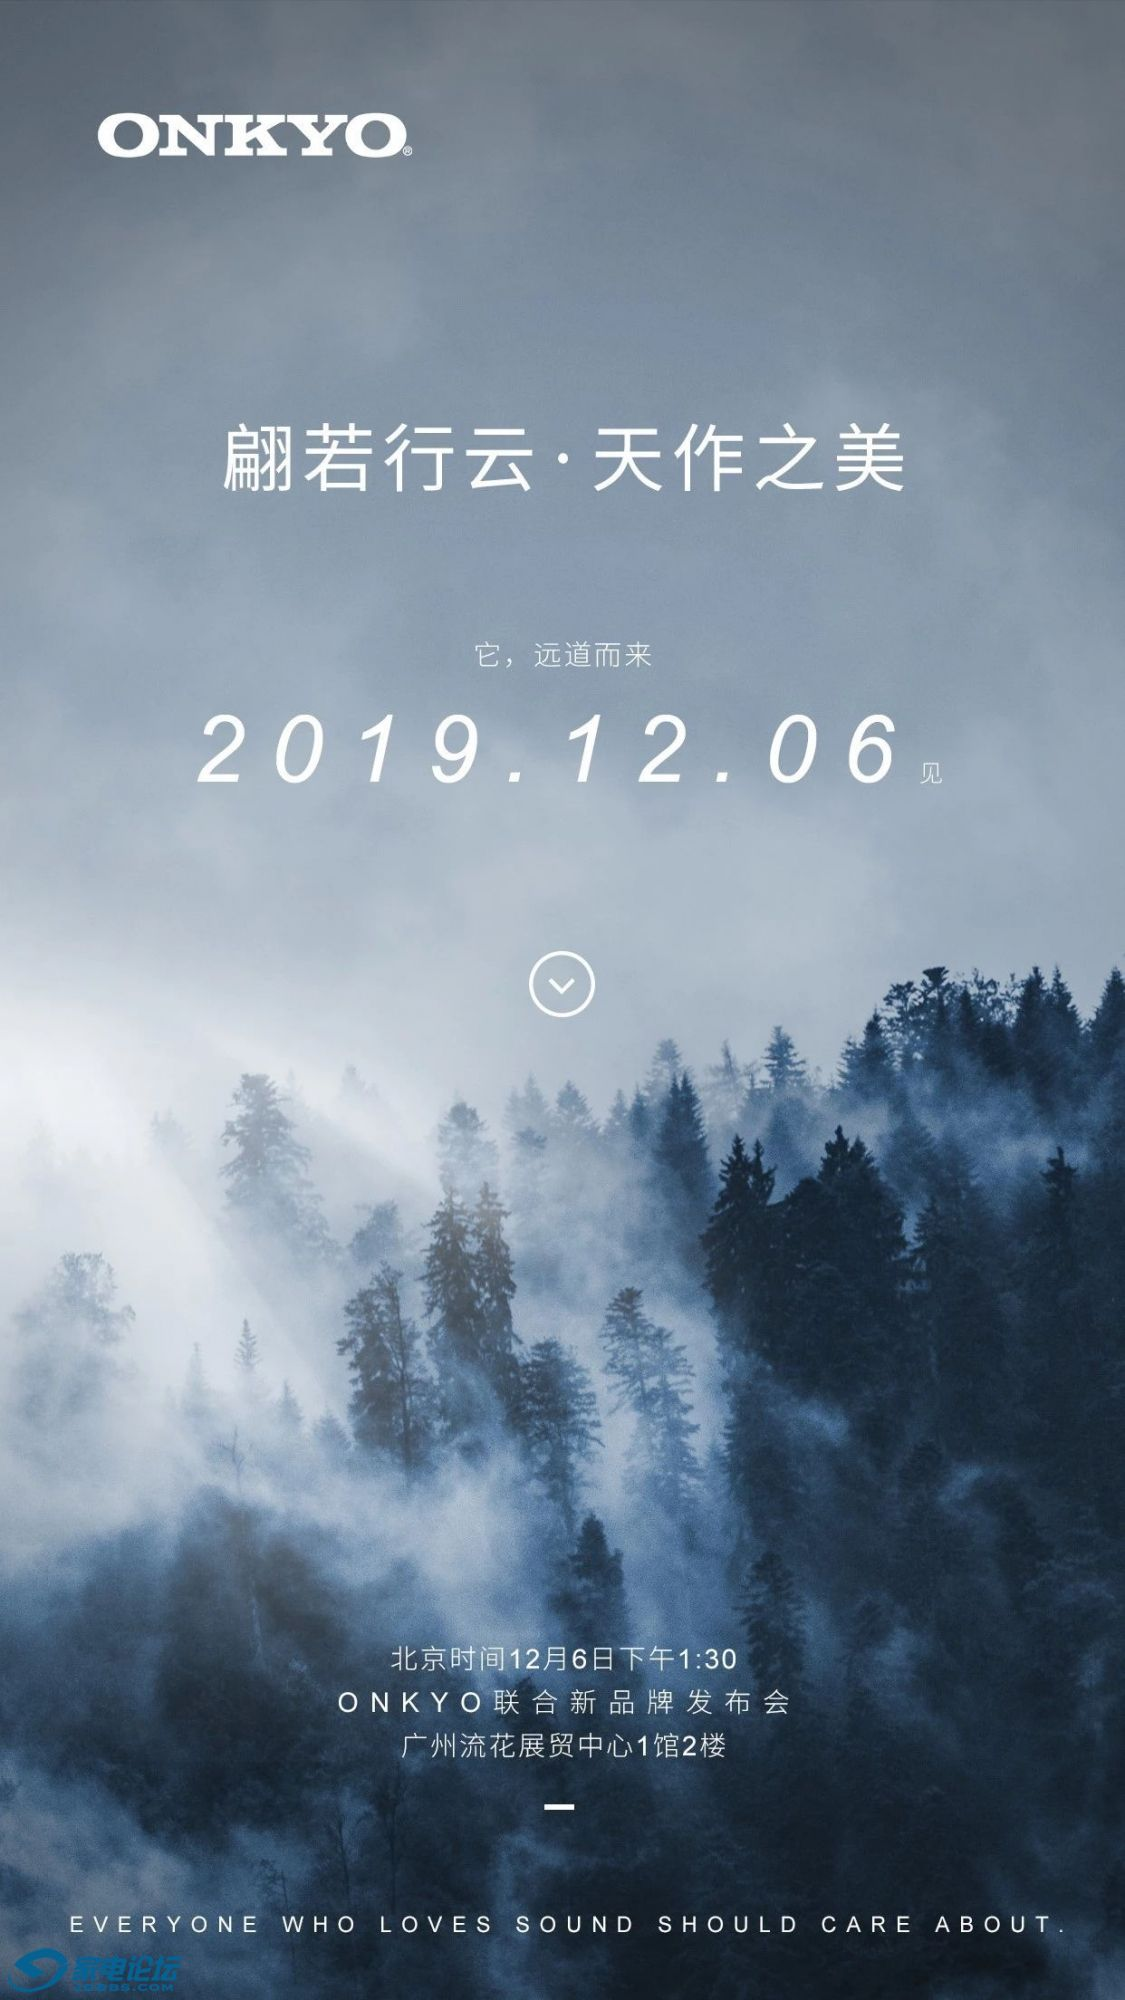 ONKYO安桥于广州宣布成为PRIMARE品牌_001.jpg